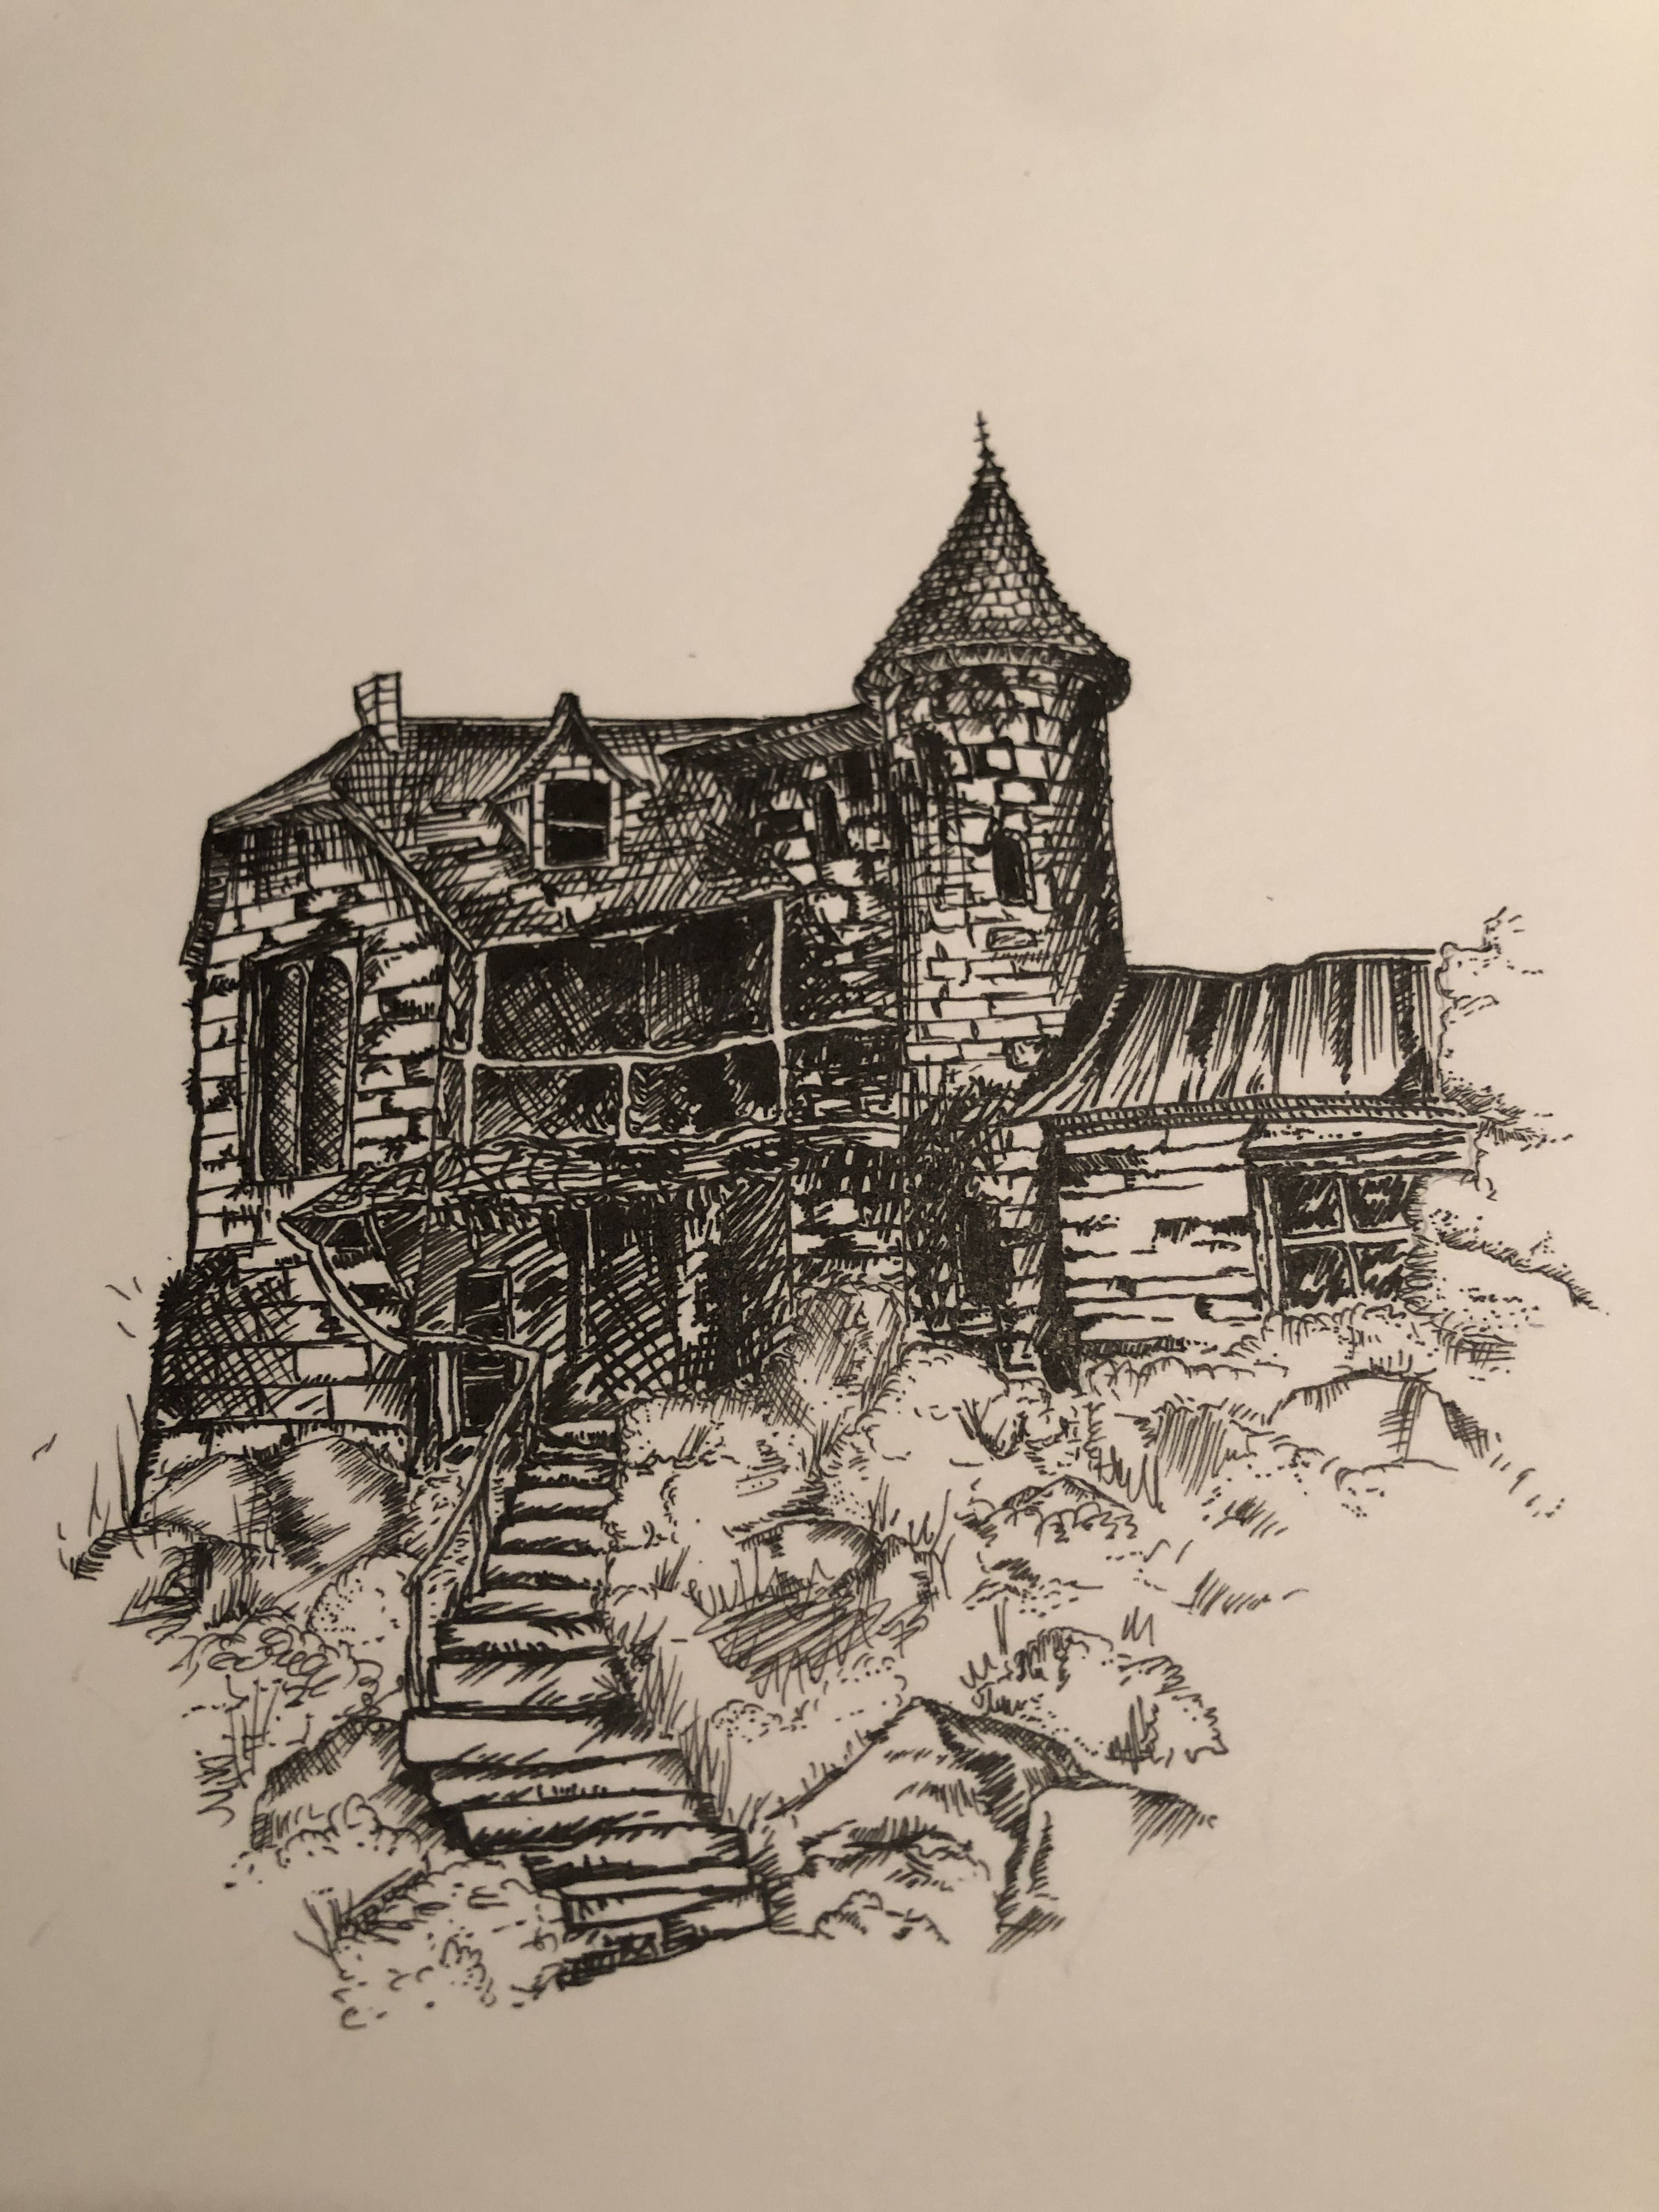 The Shrieking Shack Original Content Harry Potter Drawings Sketch Book Abstract Artwork